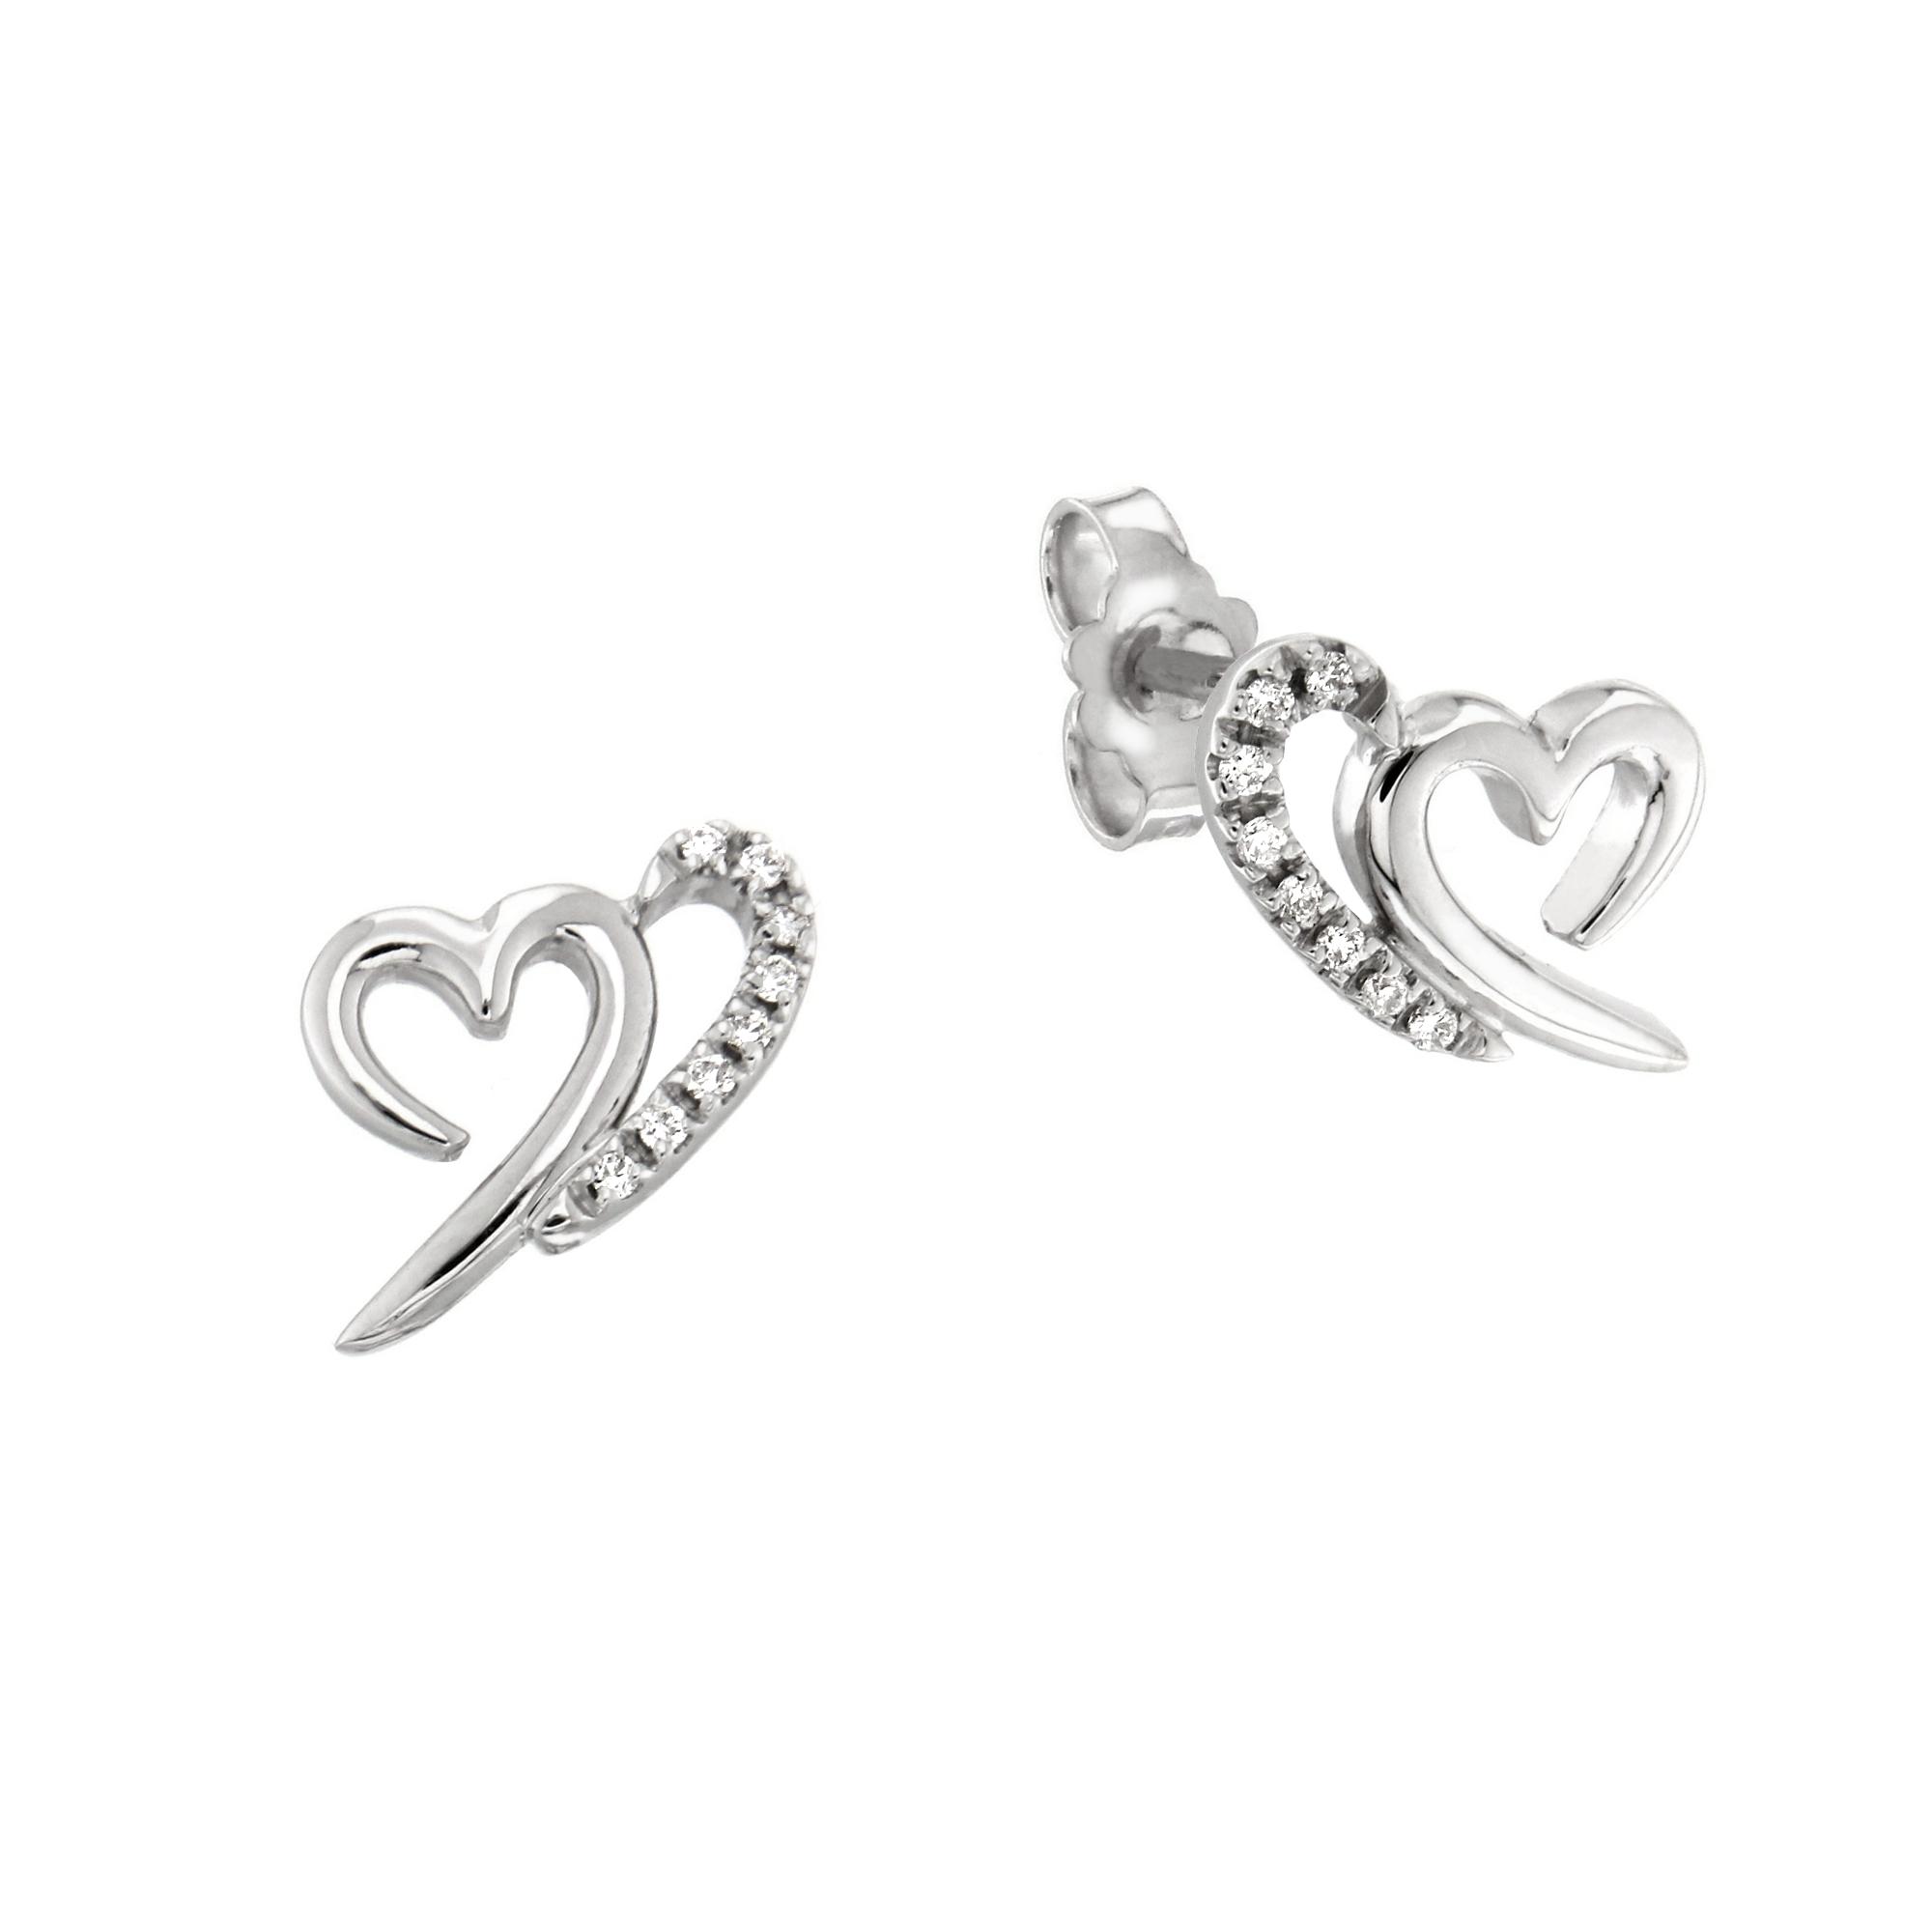 Cercei din aur alb 18K in forma de inima cu diamante 0,08 ct, model Orsini 00205BL